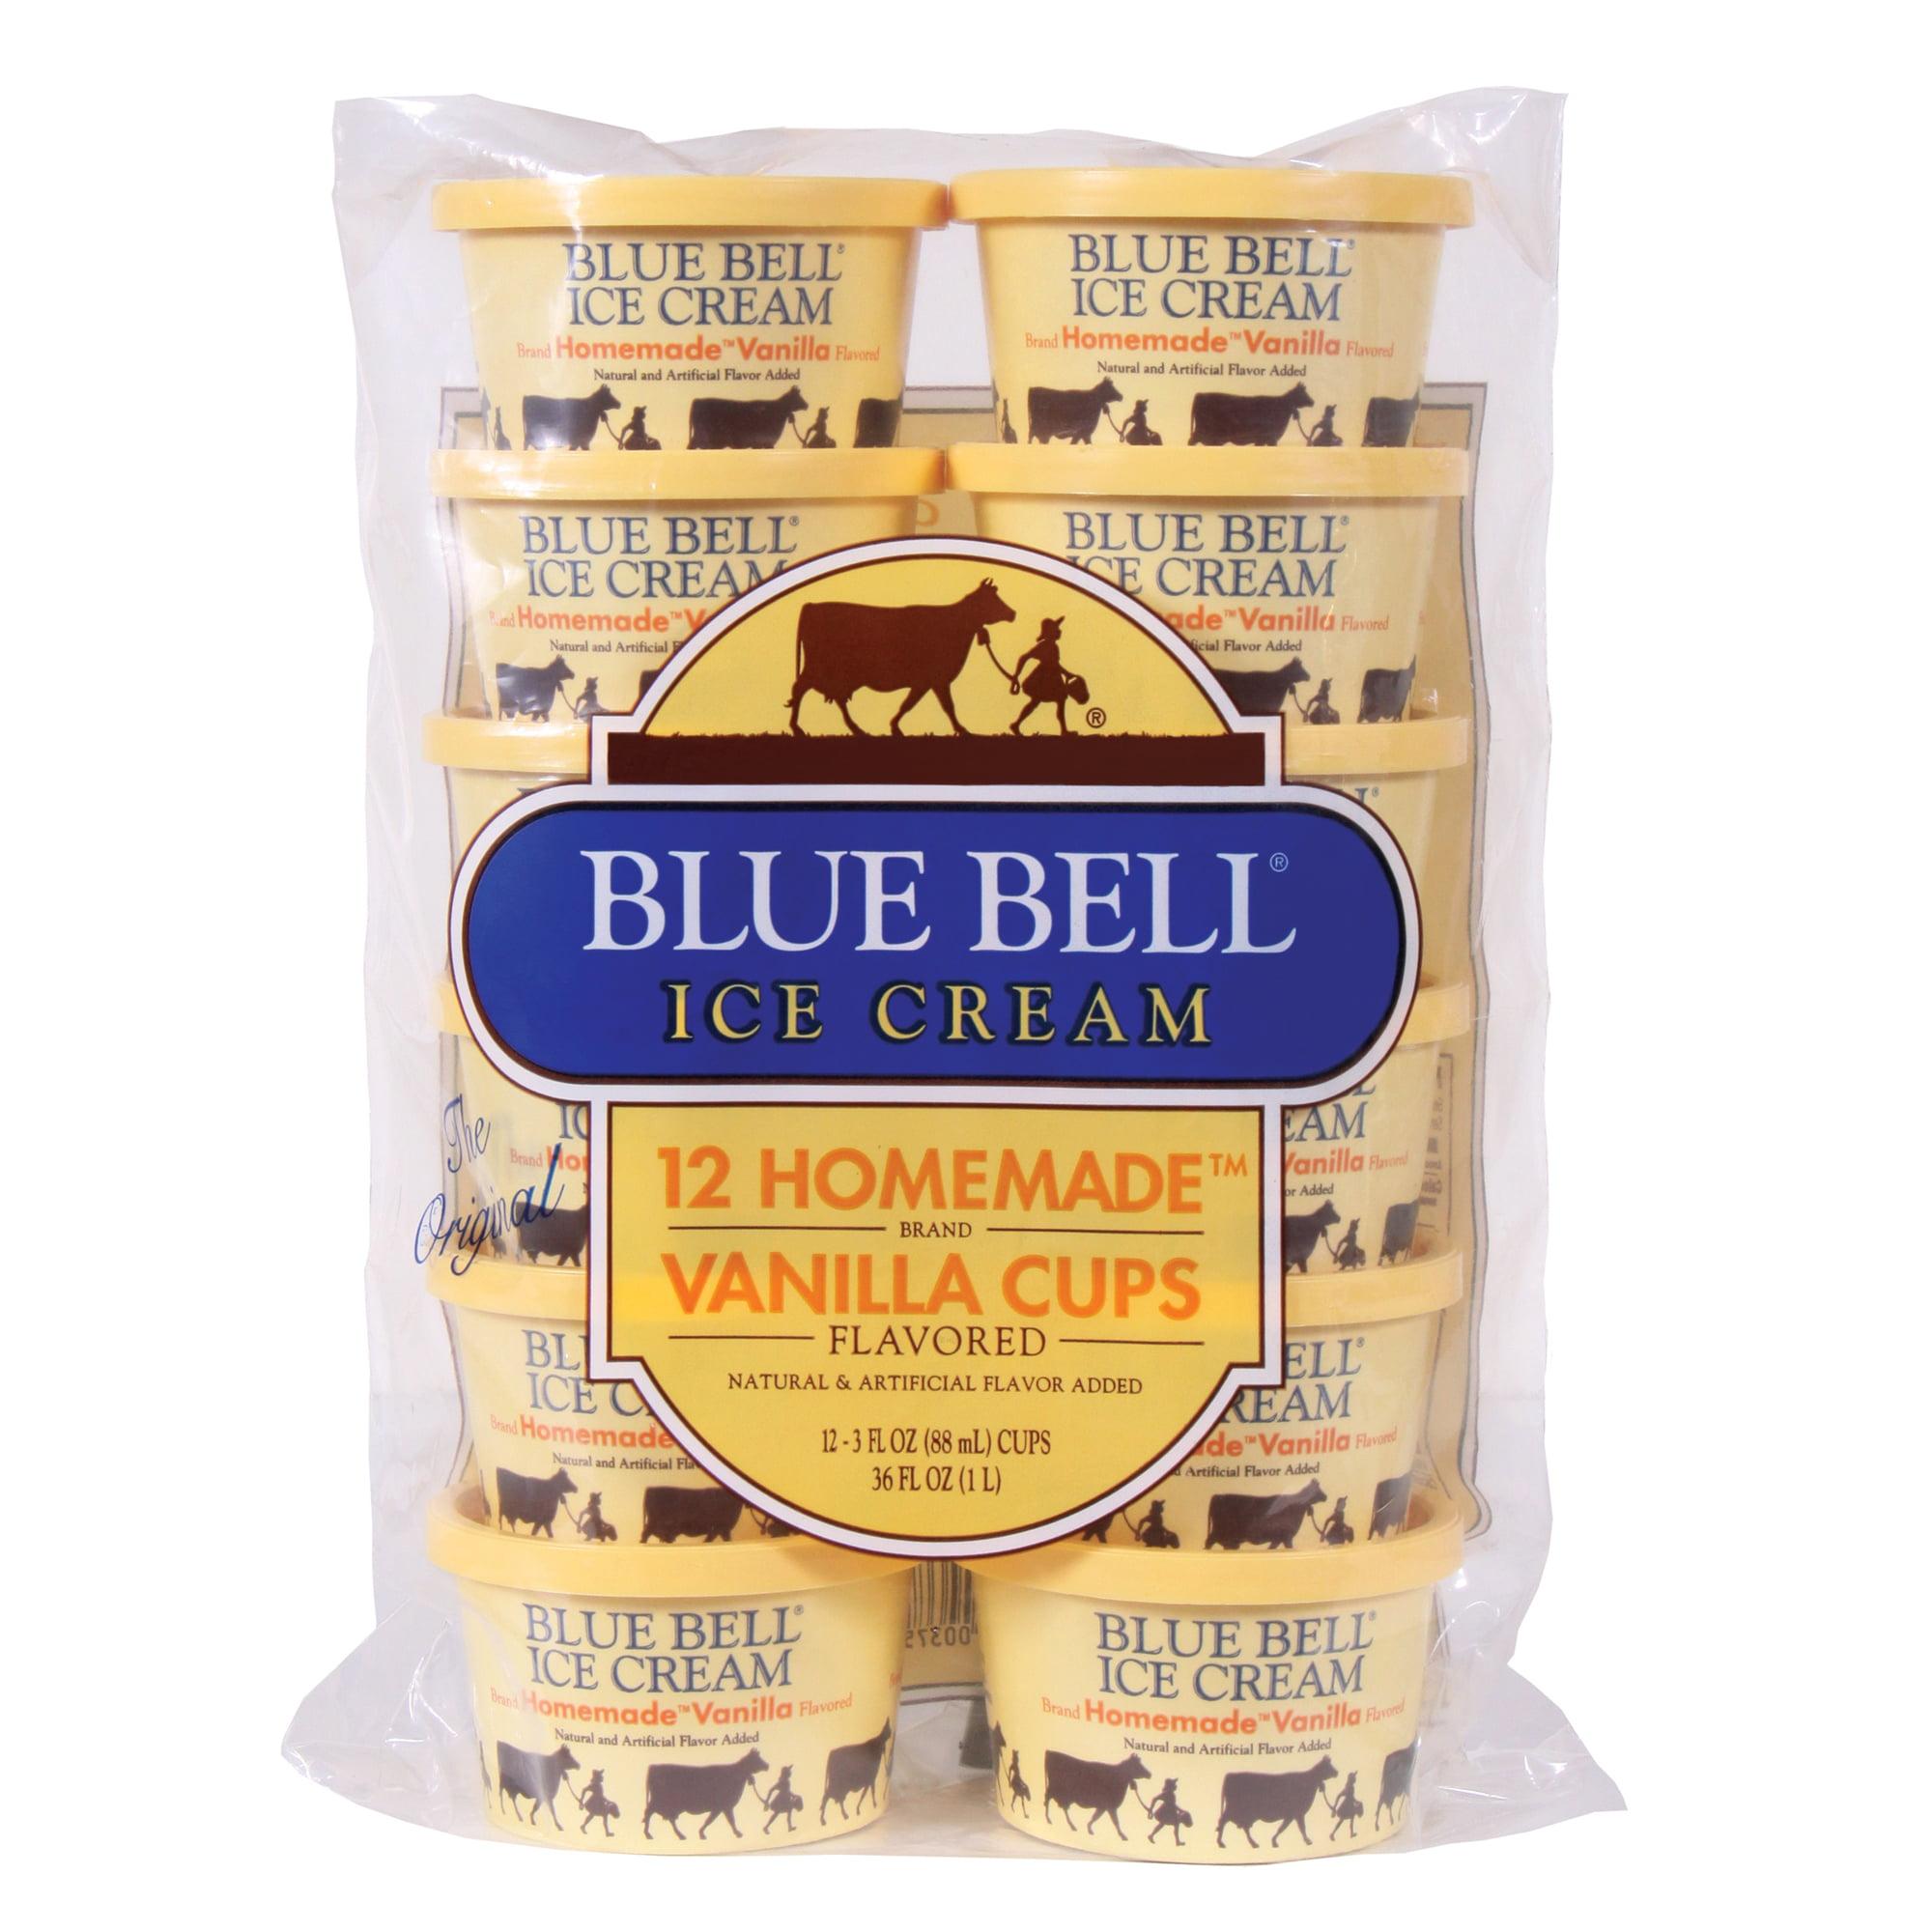 Blue Bell Homemade Vanilla Ice Cream Cups, 12ct